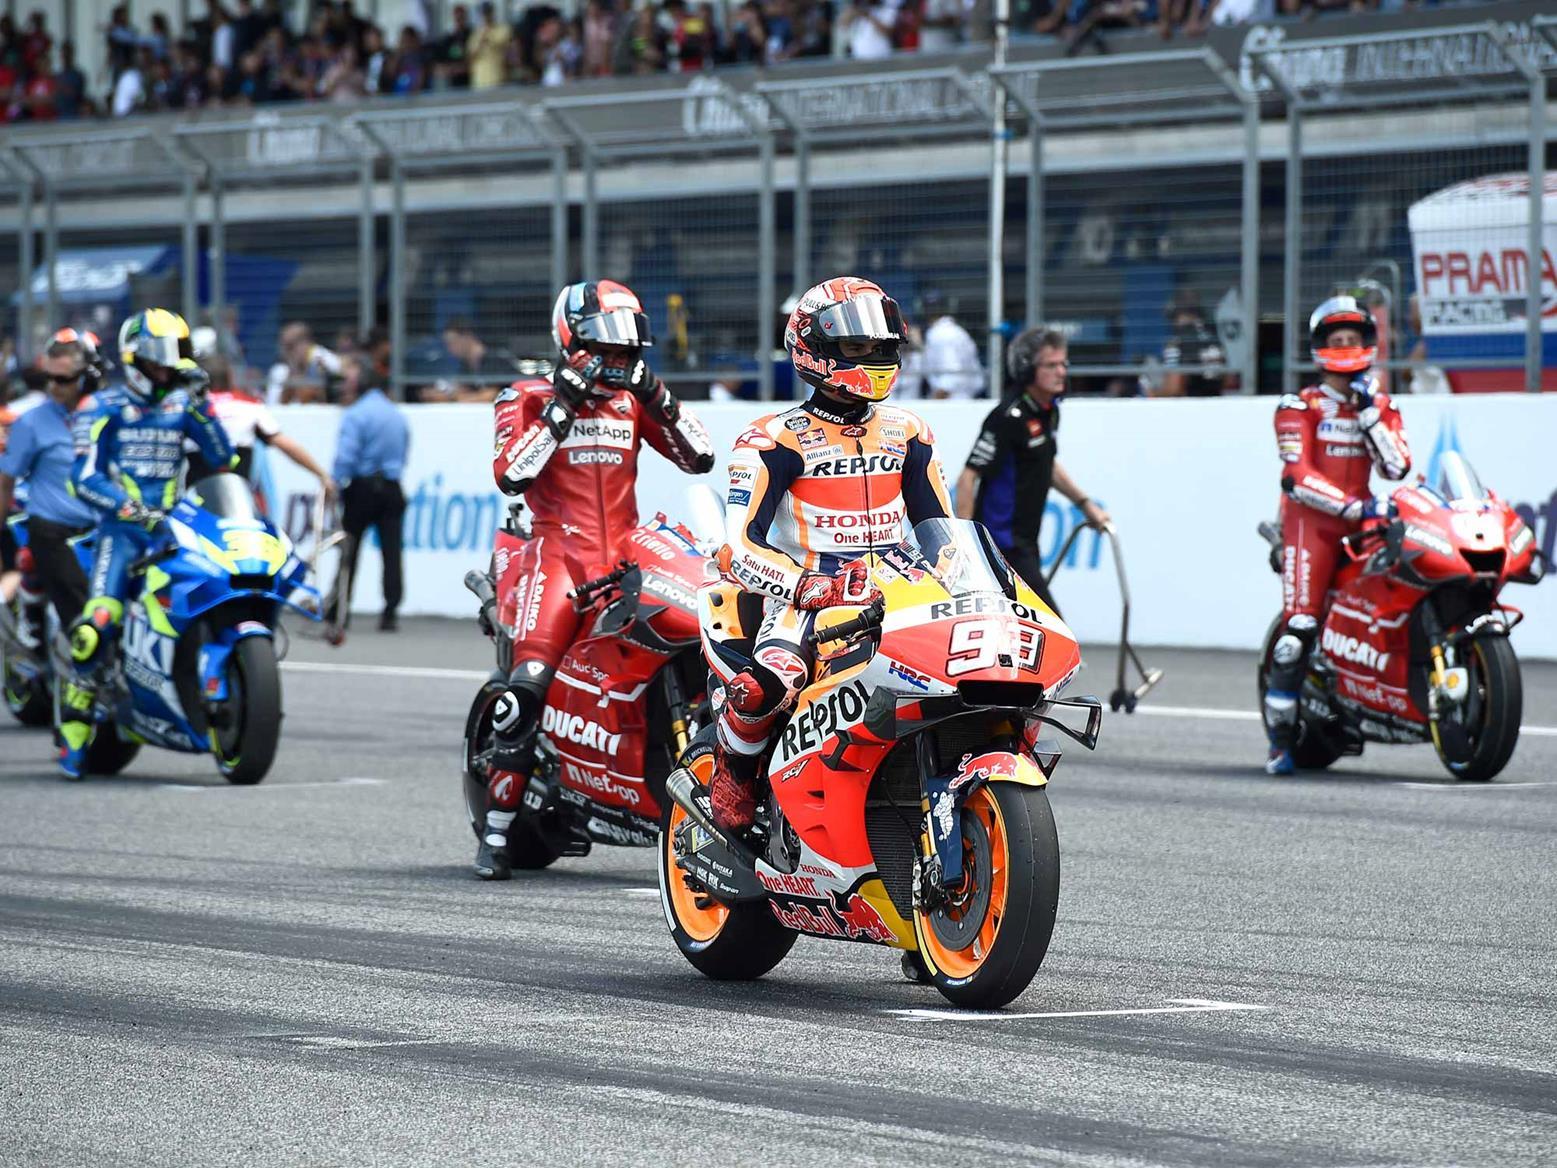 Qatar MotoGP race canceled because of virus outbreak